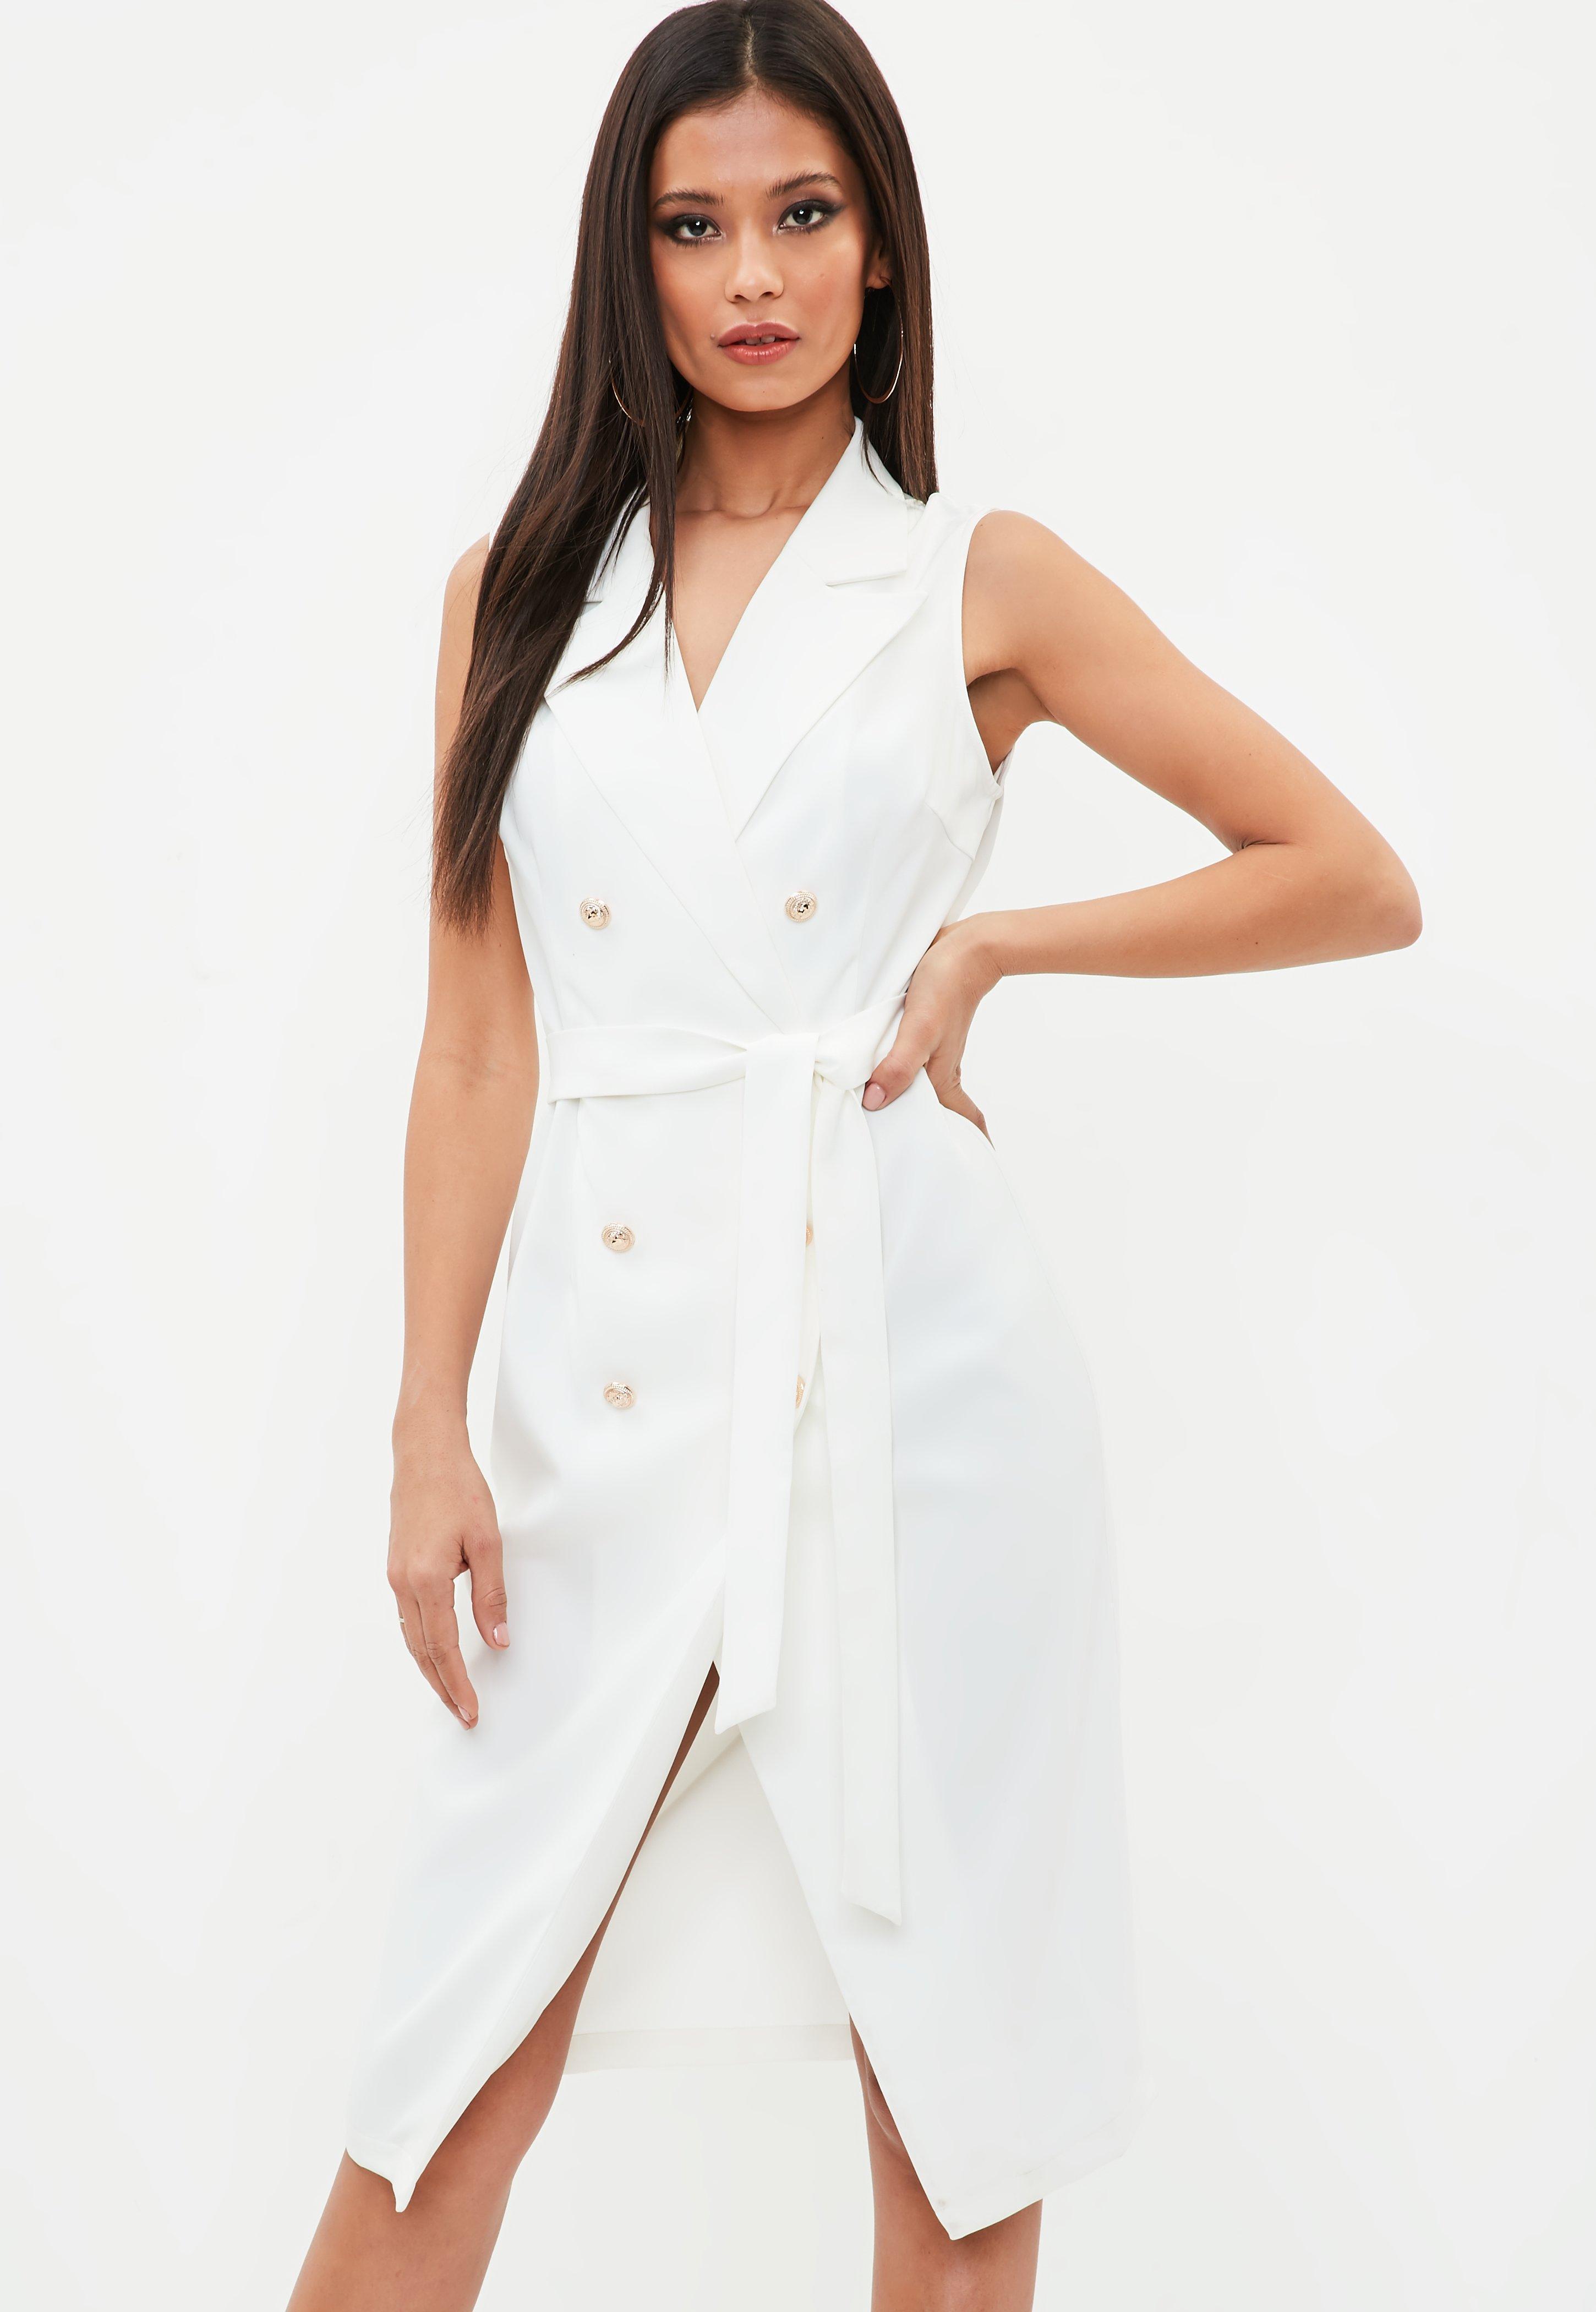 6178fb92f2b1b2 Lyst - Missguided White Sleeveless Belted Midi Blazer Dress in White